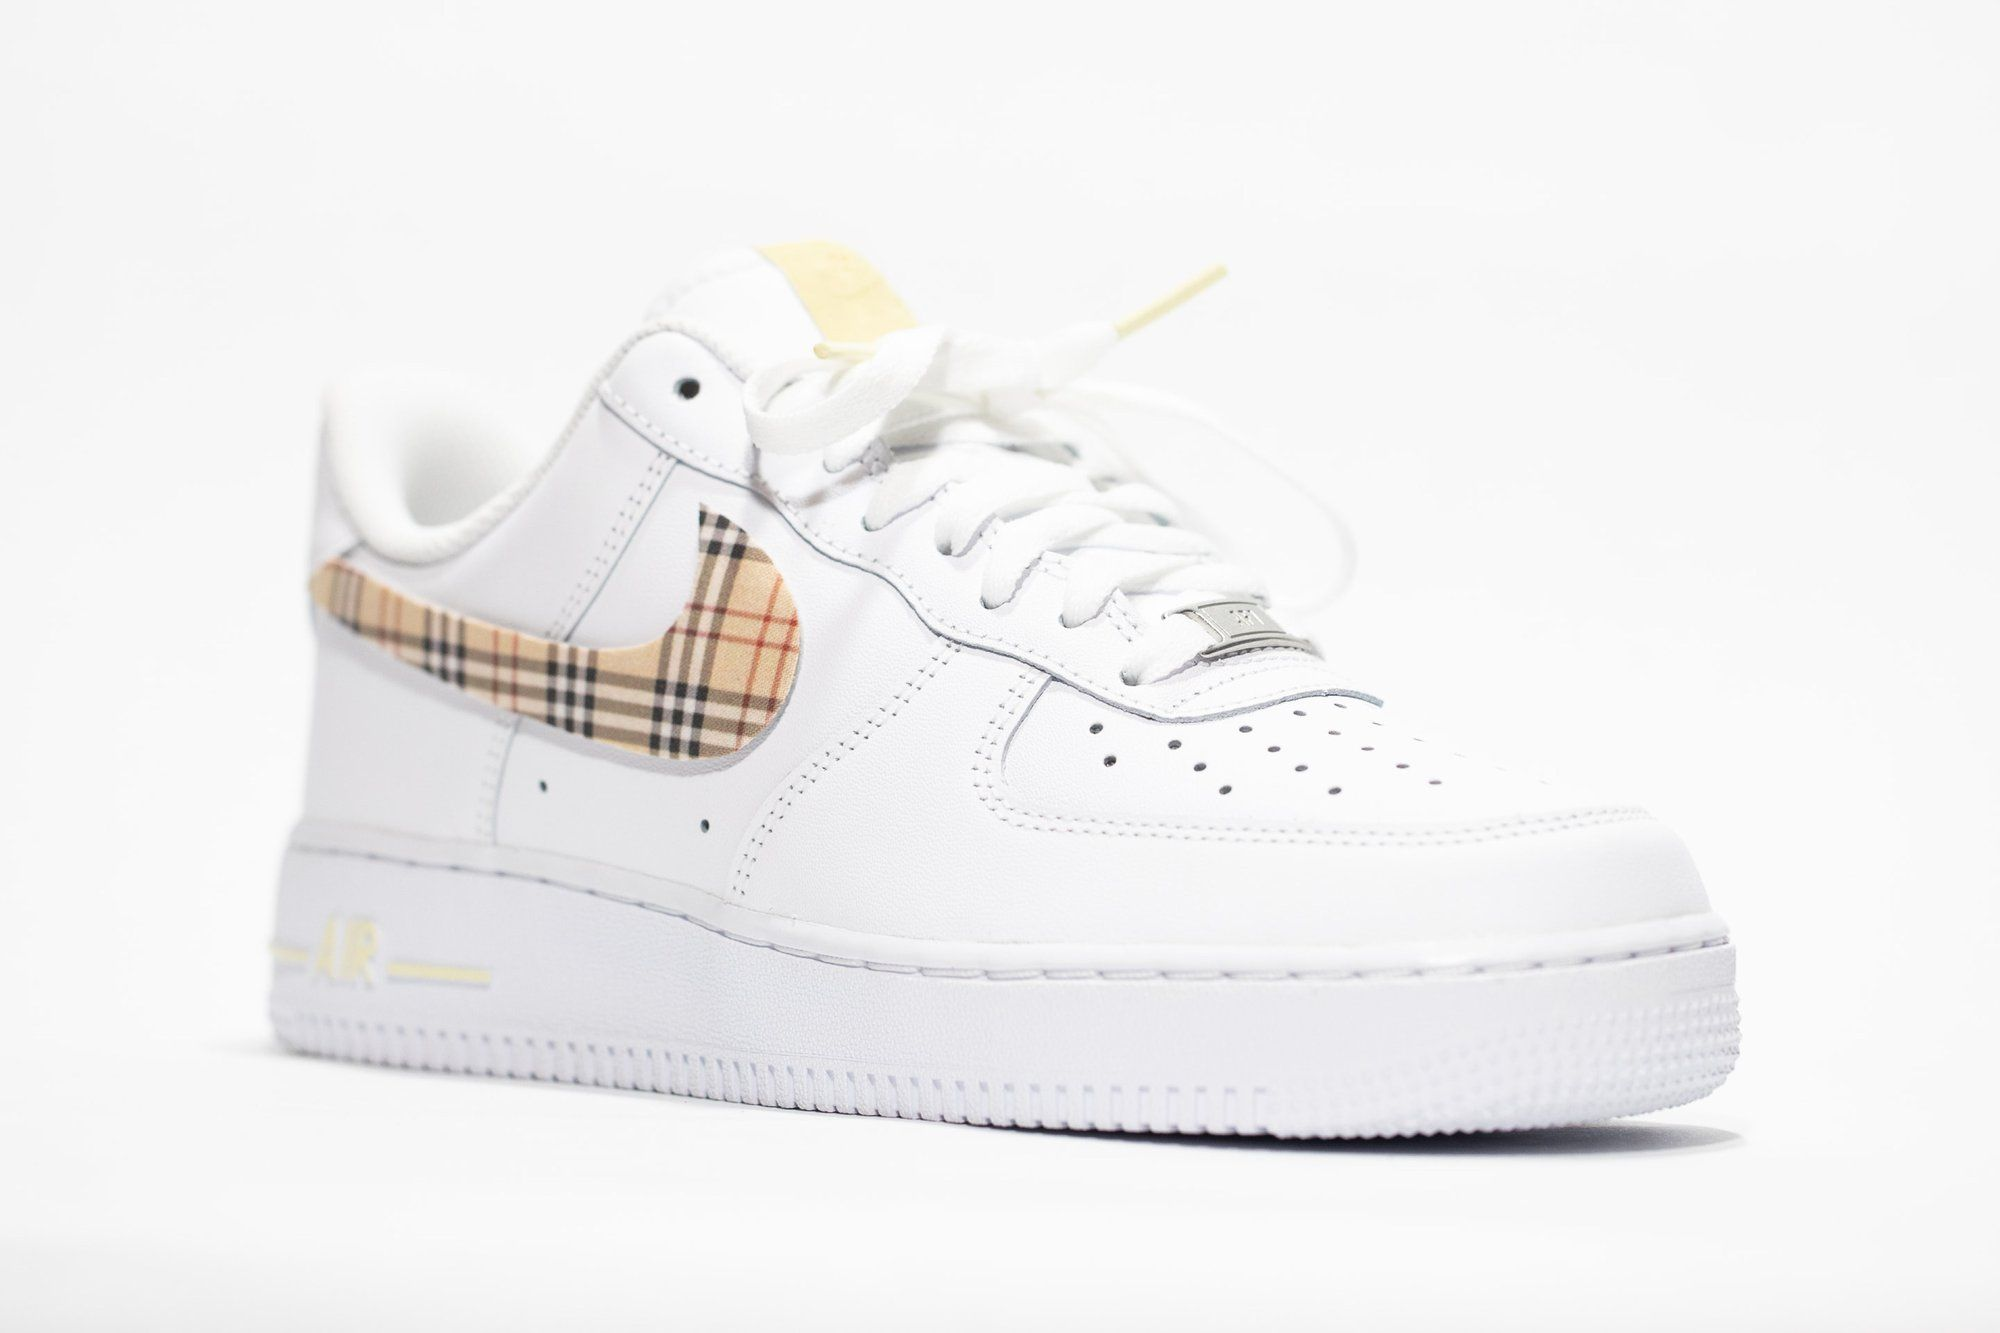 Nike Air Force 1 Custom 'Plaid' Old